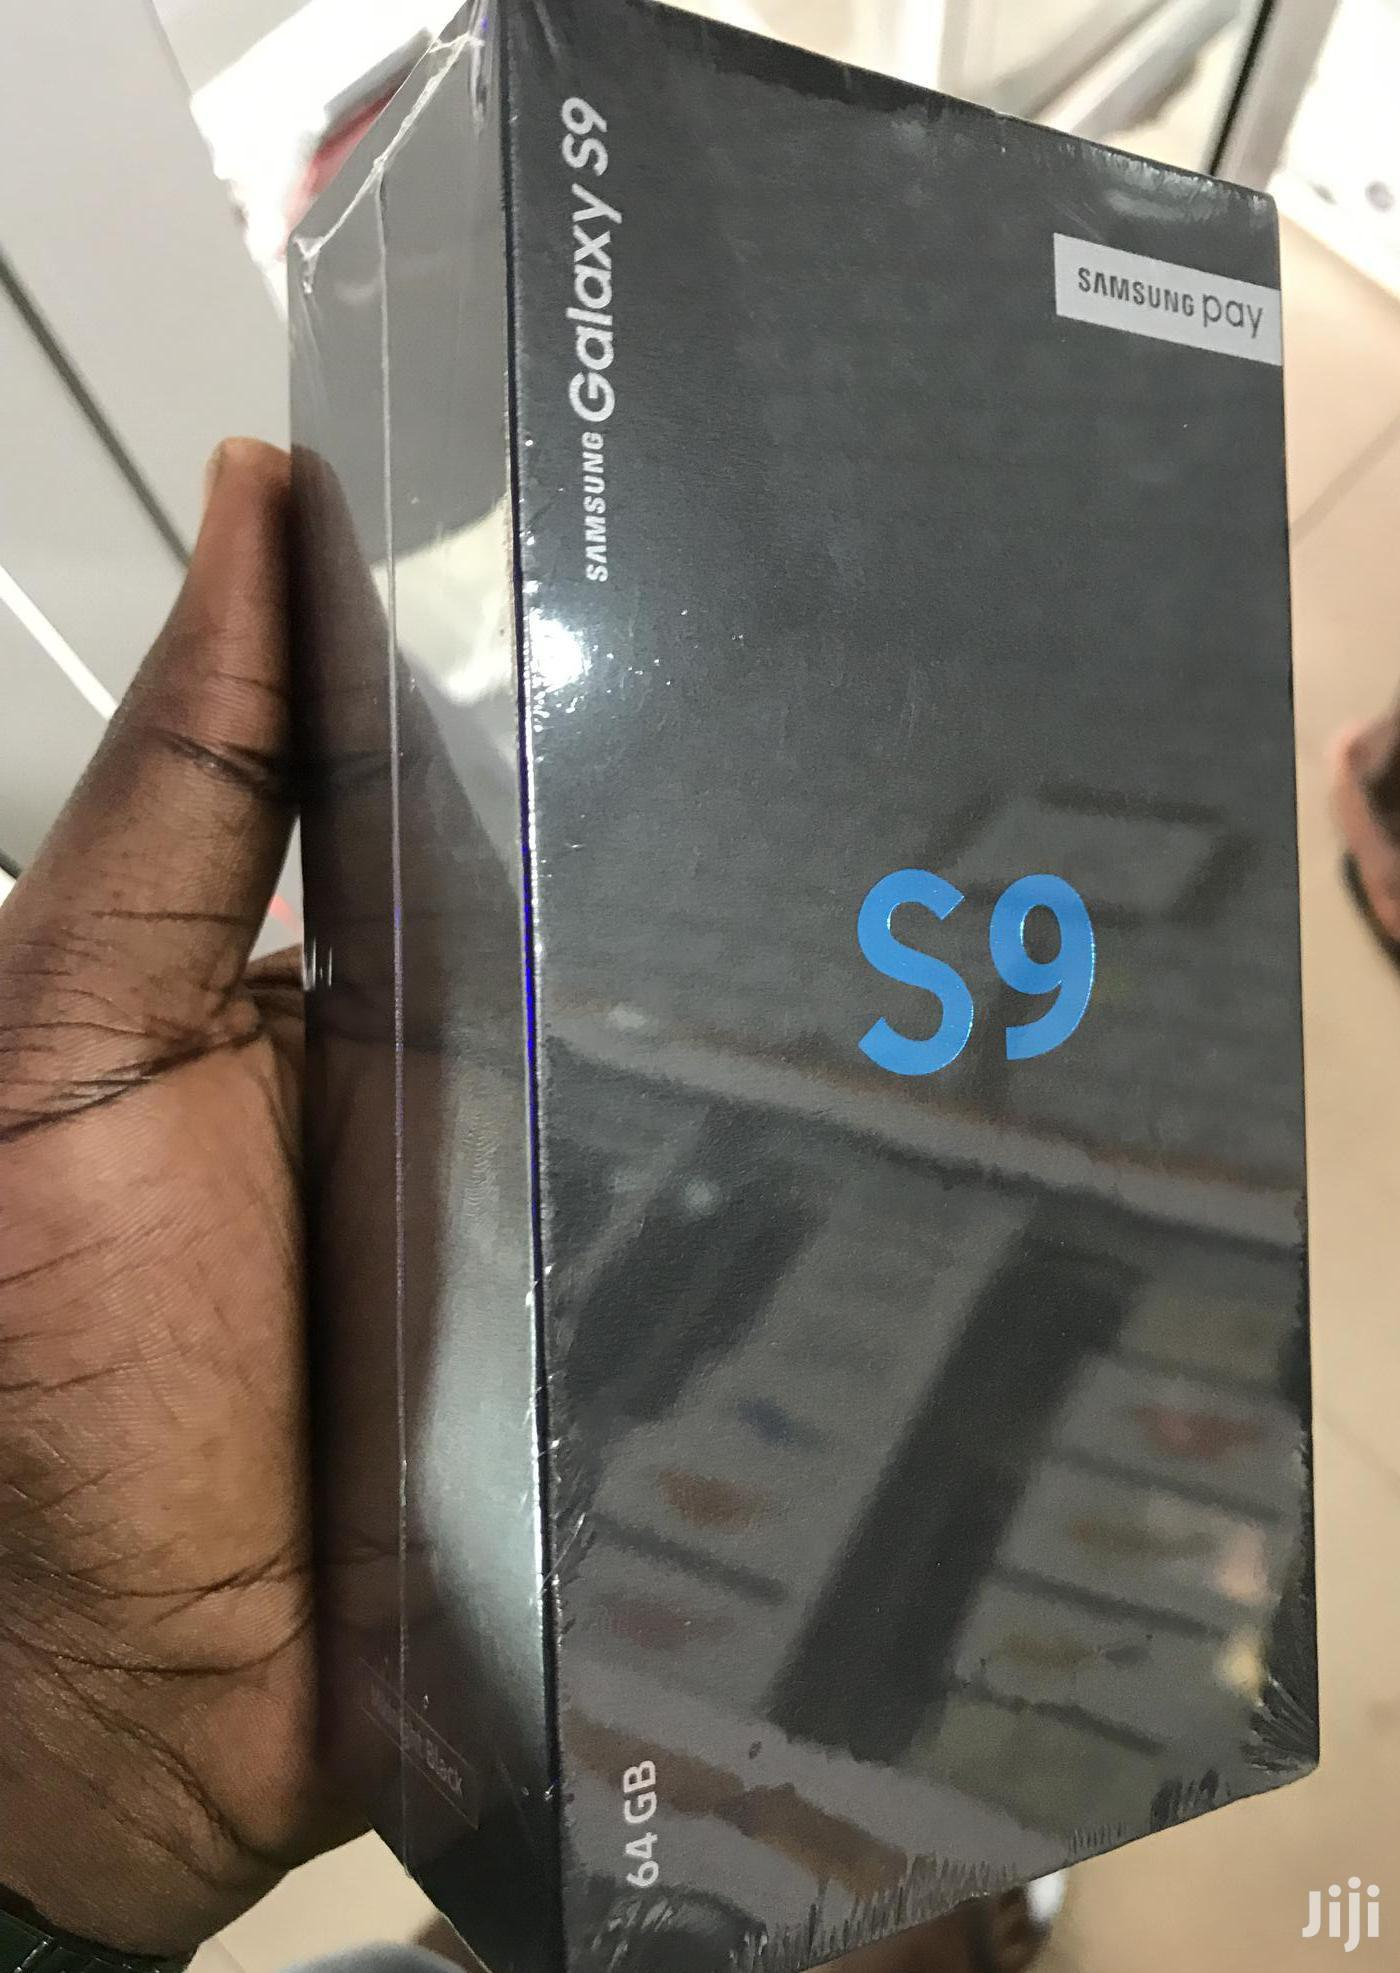 New Samsung Galaxy S9 64 GB Black   Mobile Phones for sale in Kumasi Metropolitan, Ashanti, Ghana